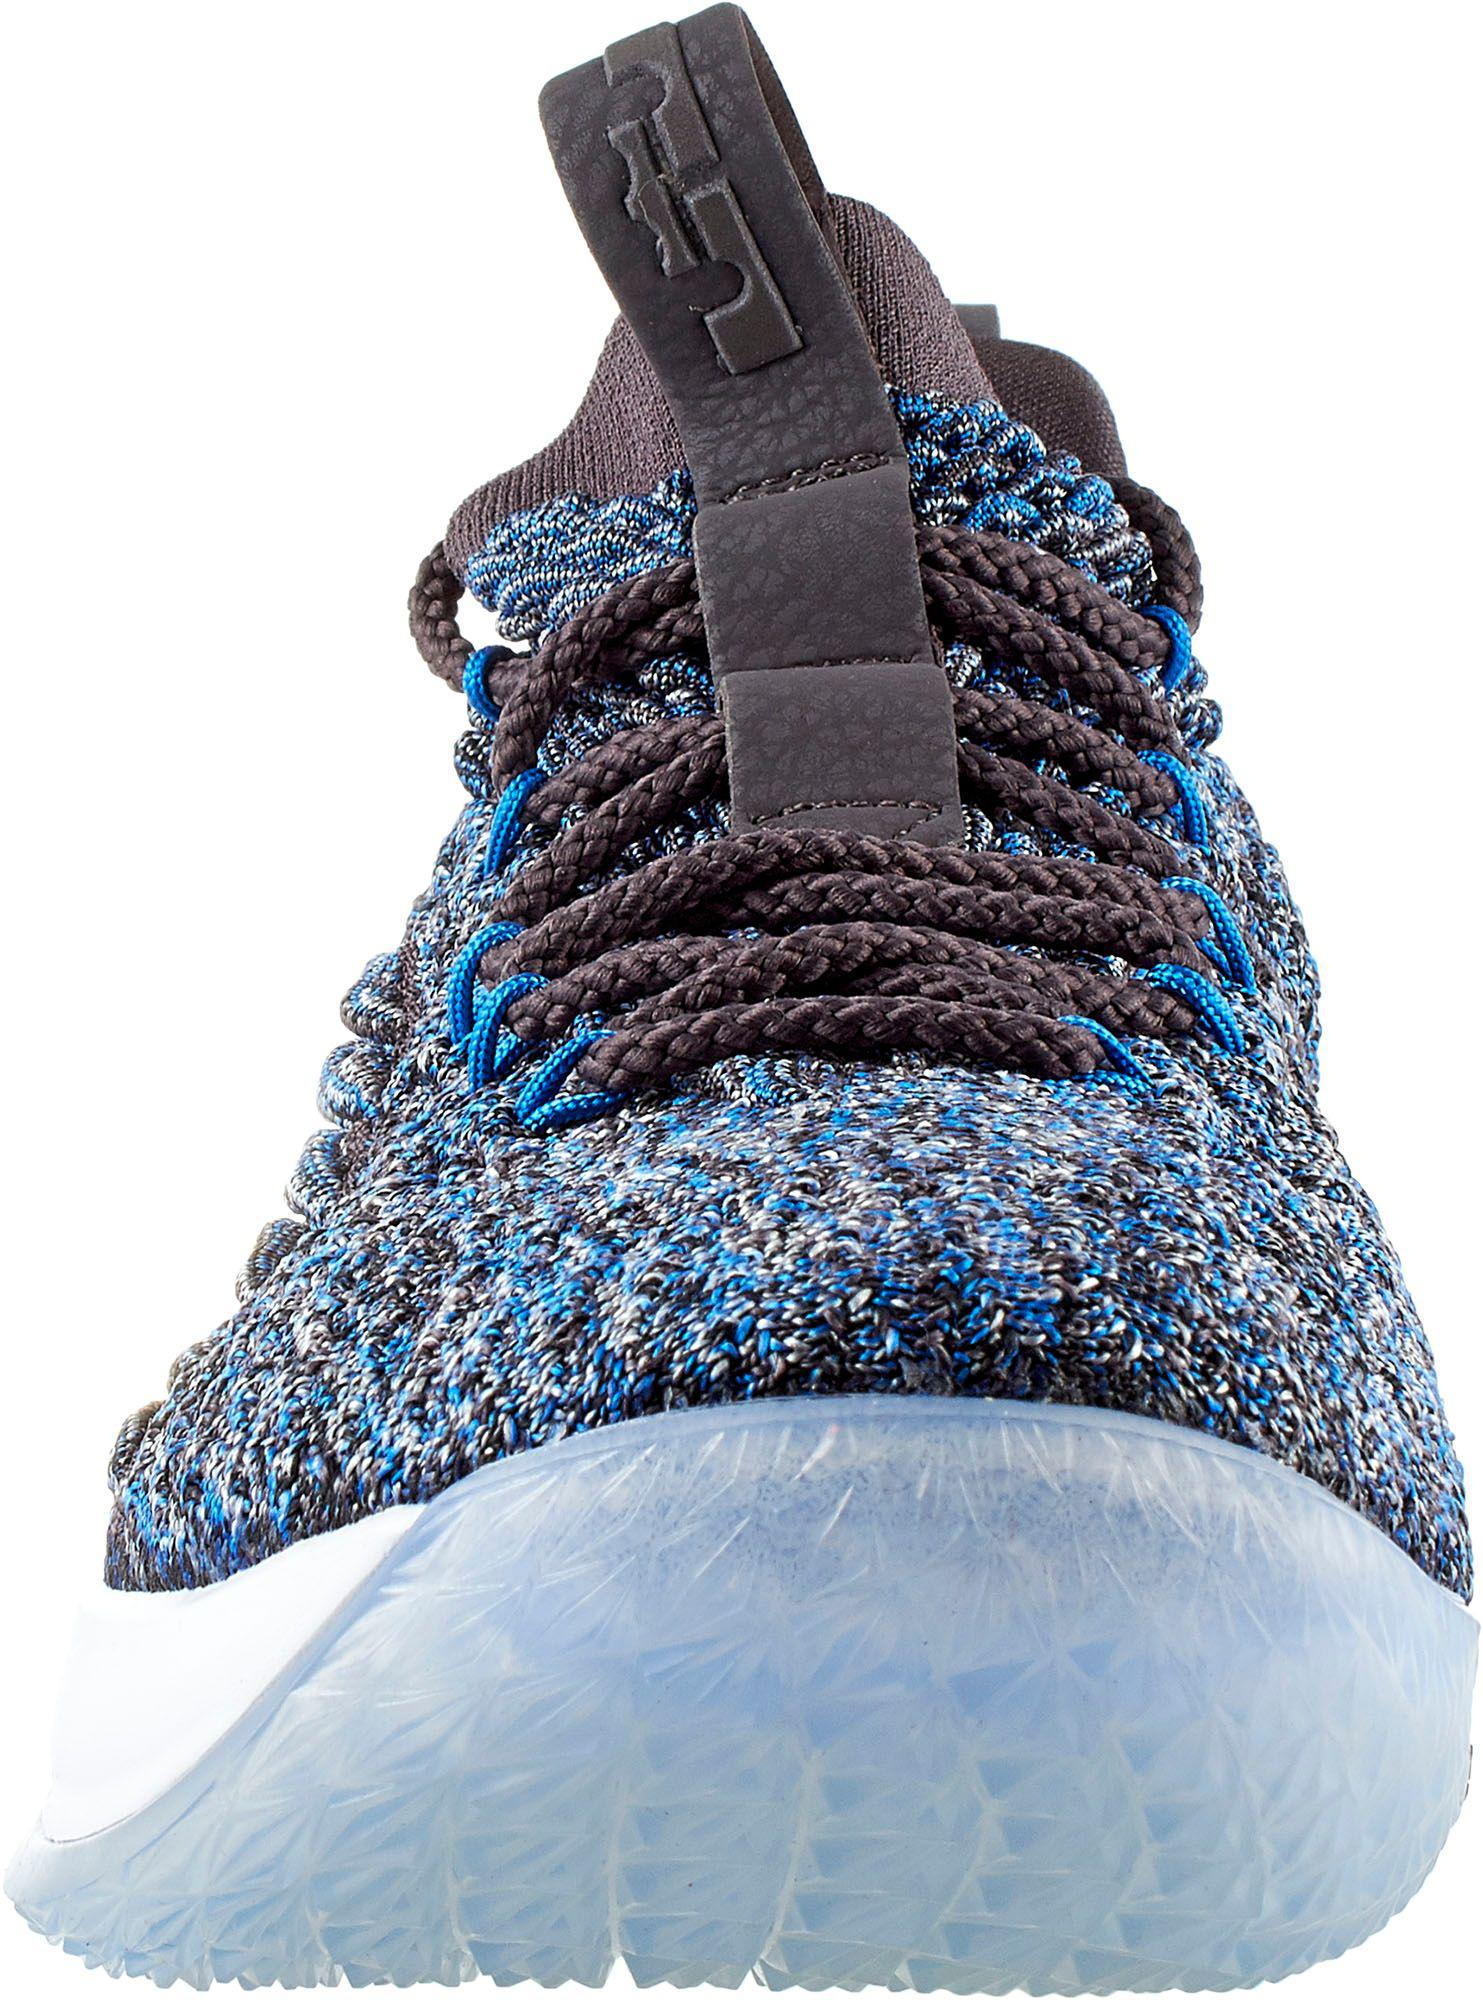 innovative design 0790e 604c5 Men's Blue Lebron 15 Low Basketball Shoes